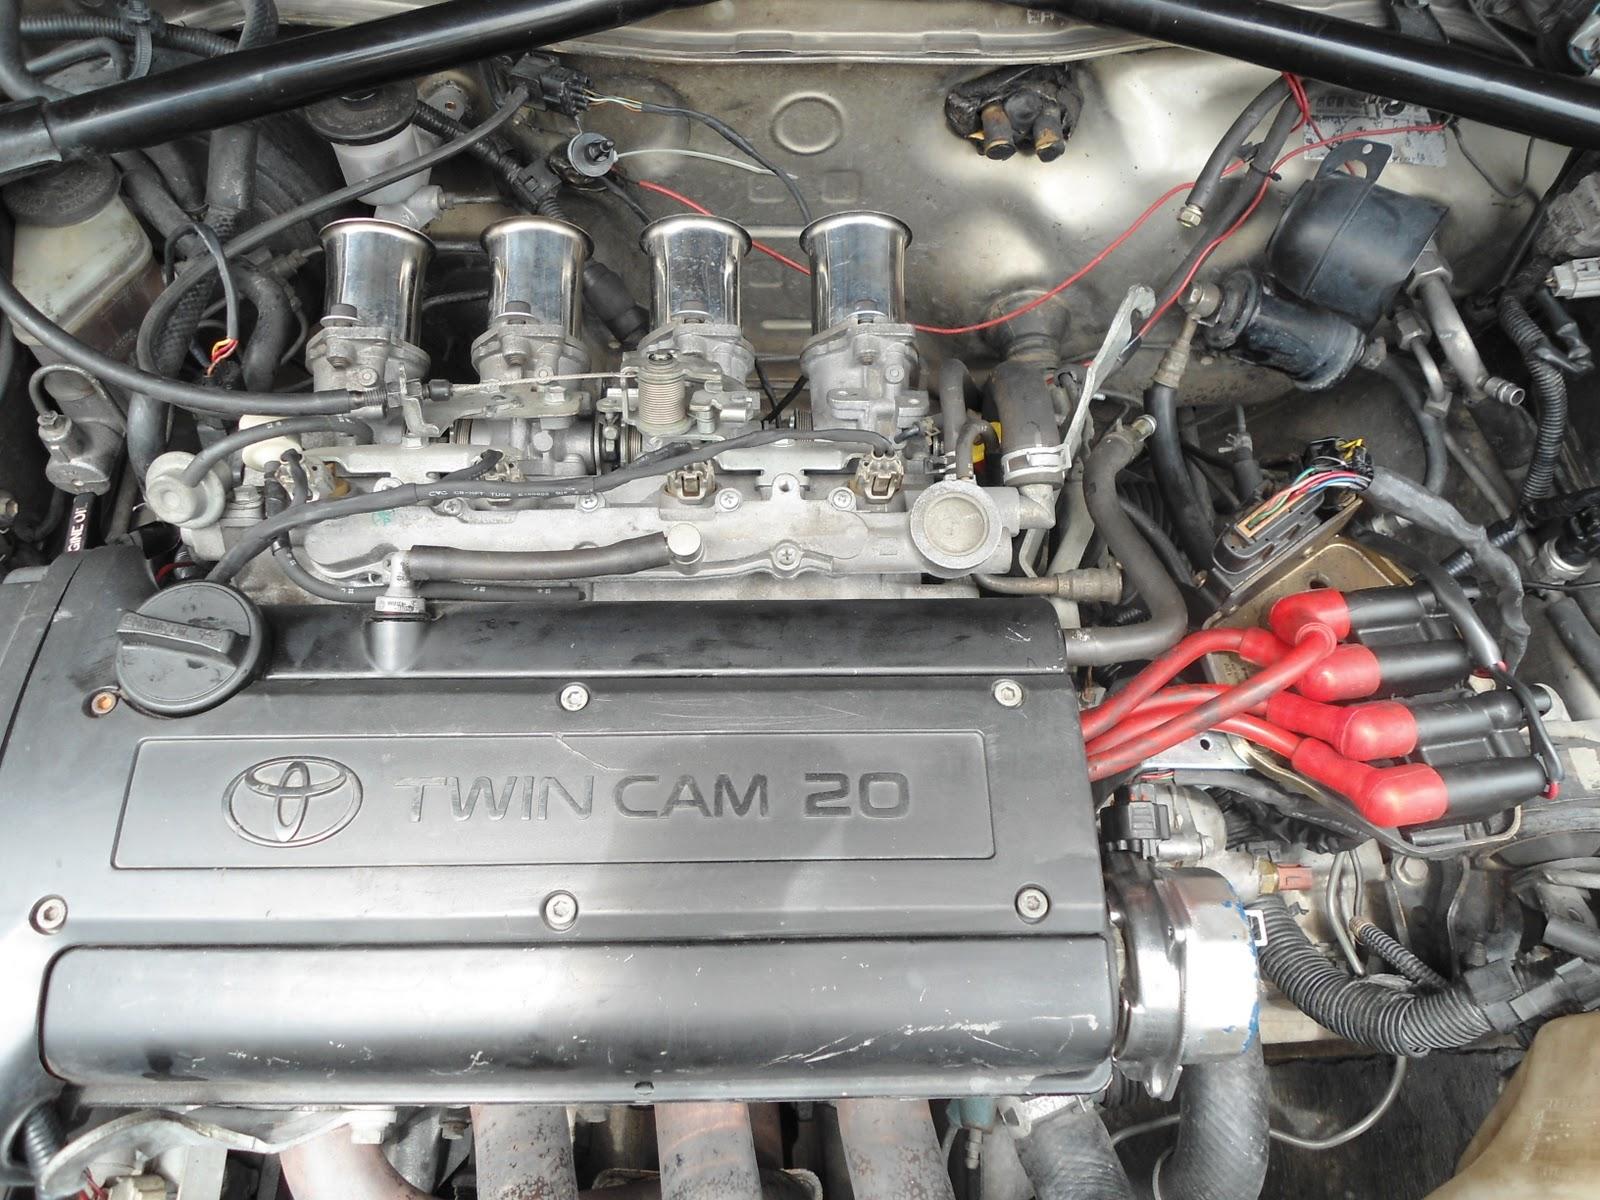 medium resolution of 2004 nissan quest engine wiring harness additionally an 99 nissan